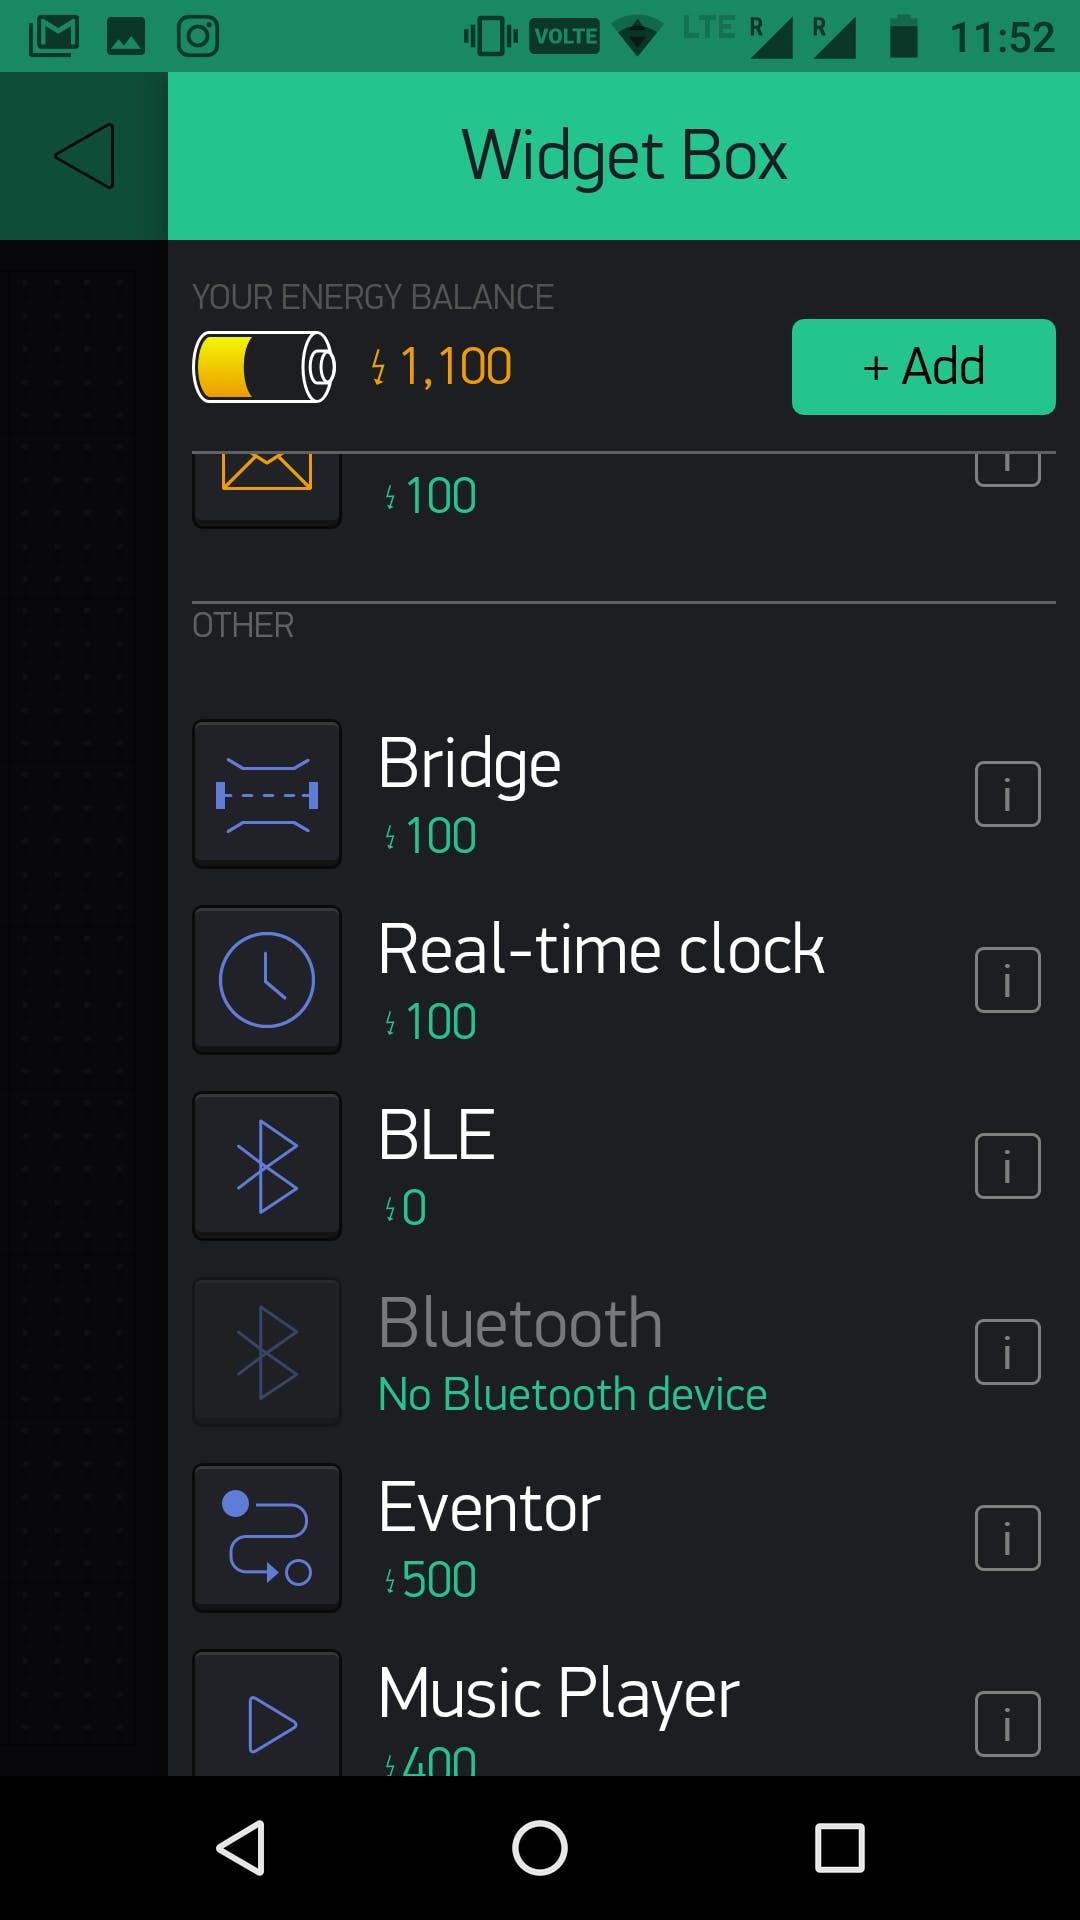 Select BLE